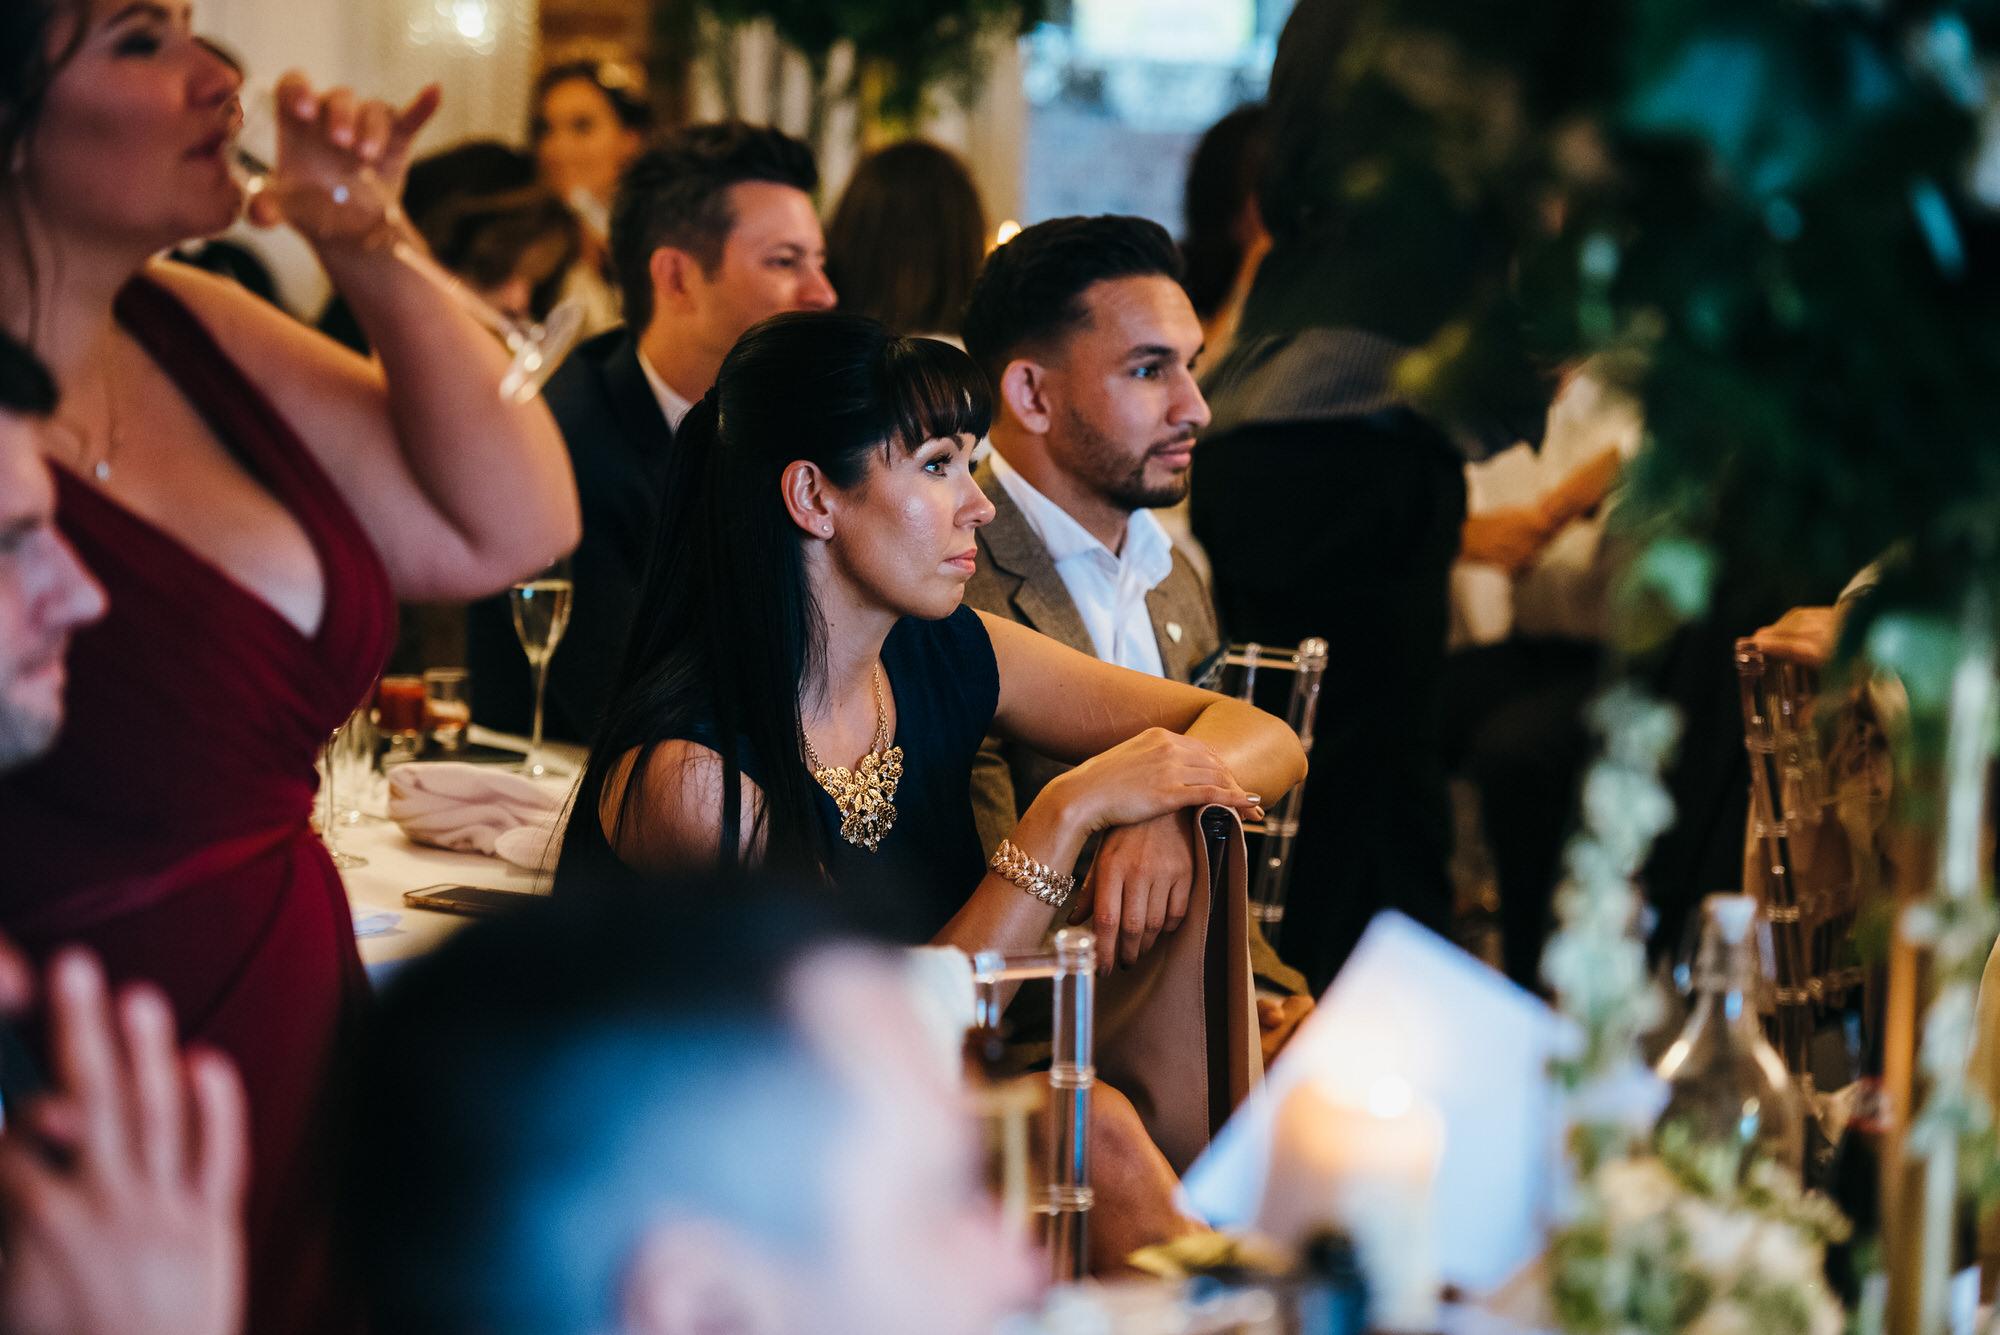 Merrydale manor wedding photography 088